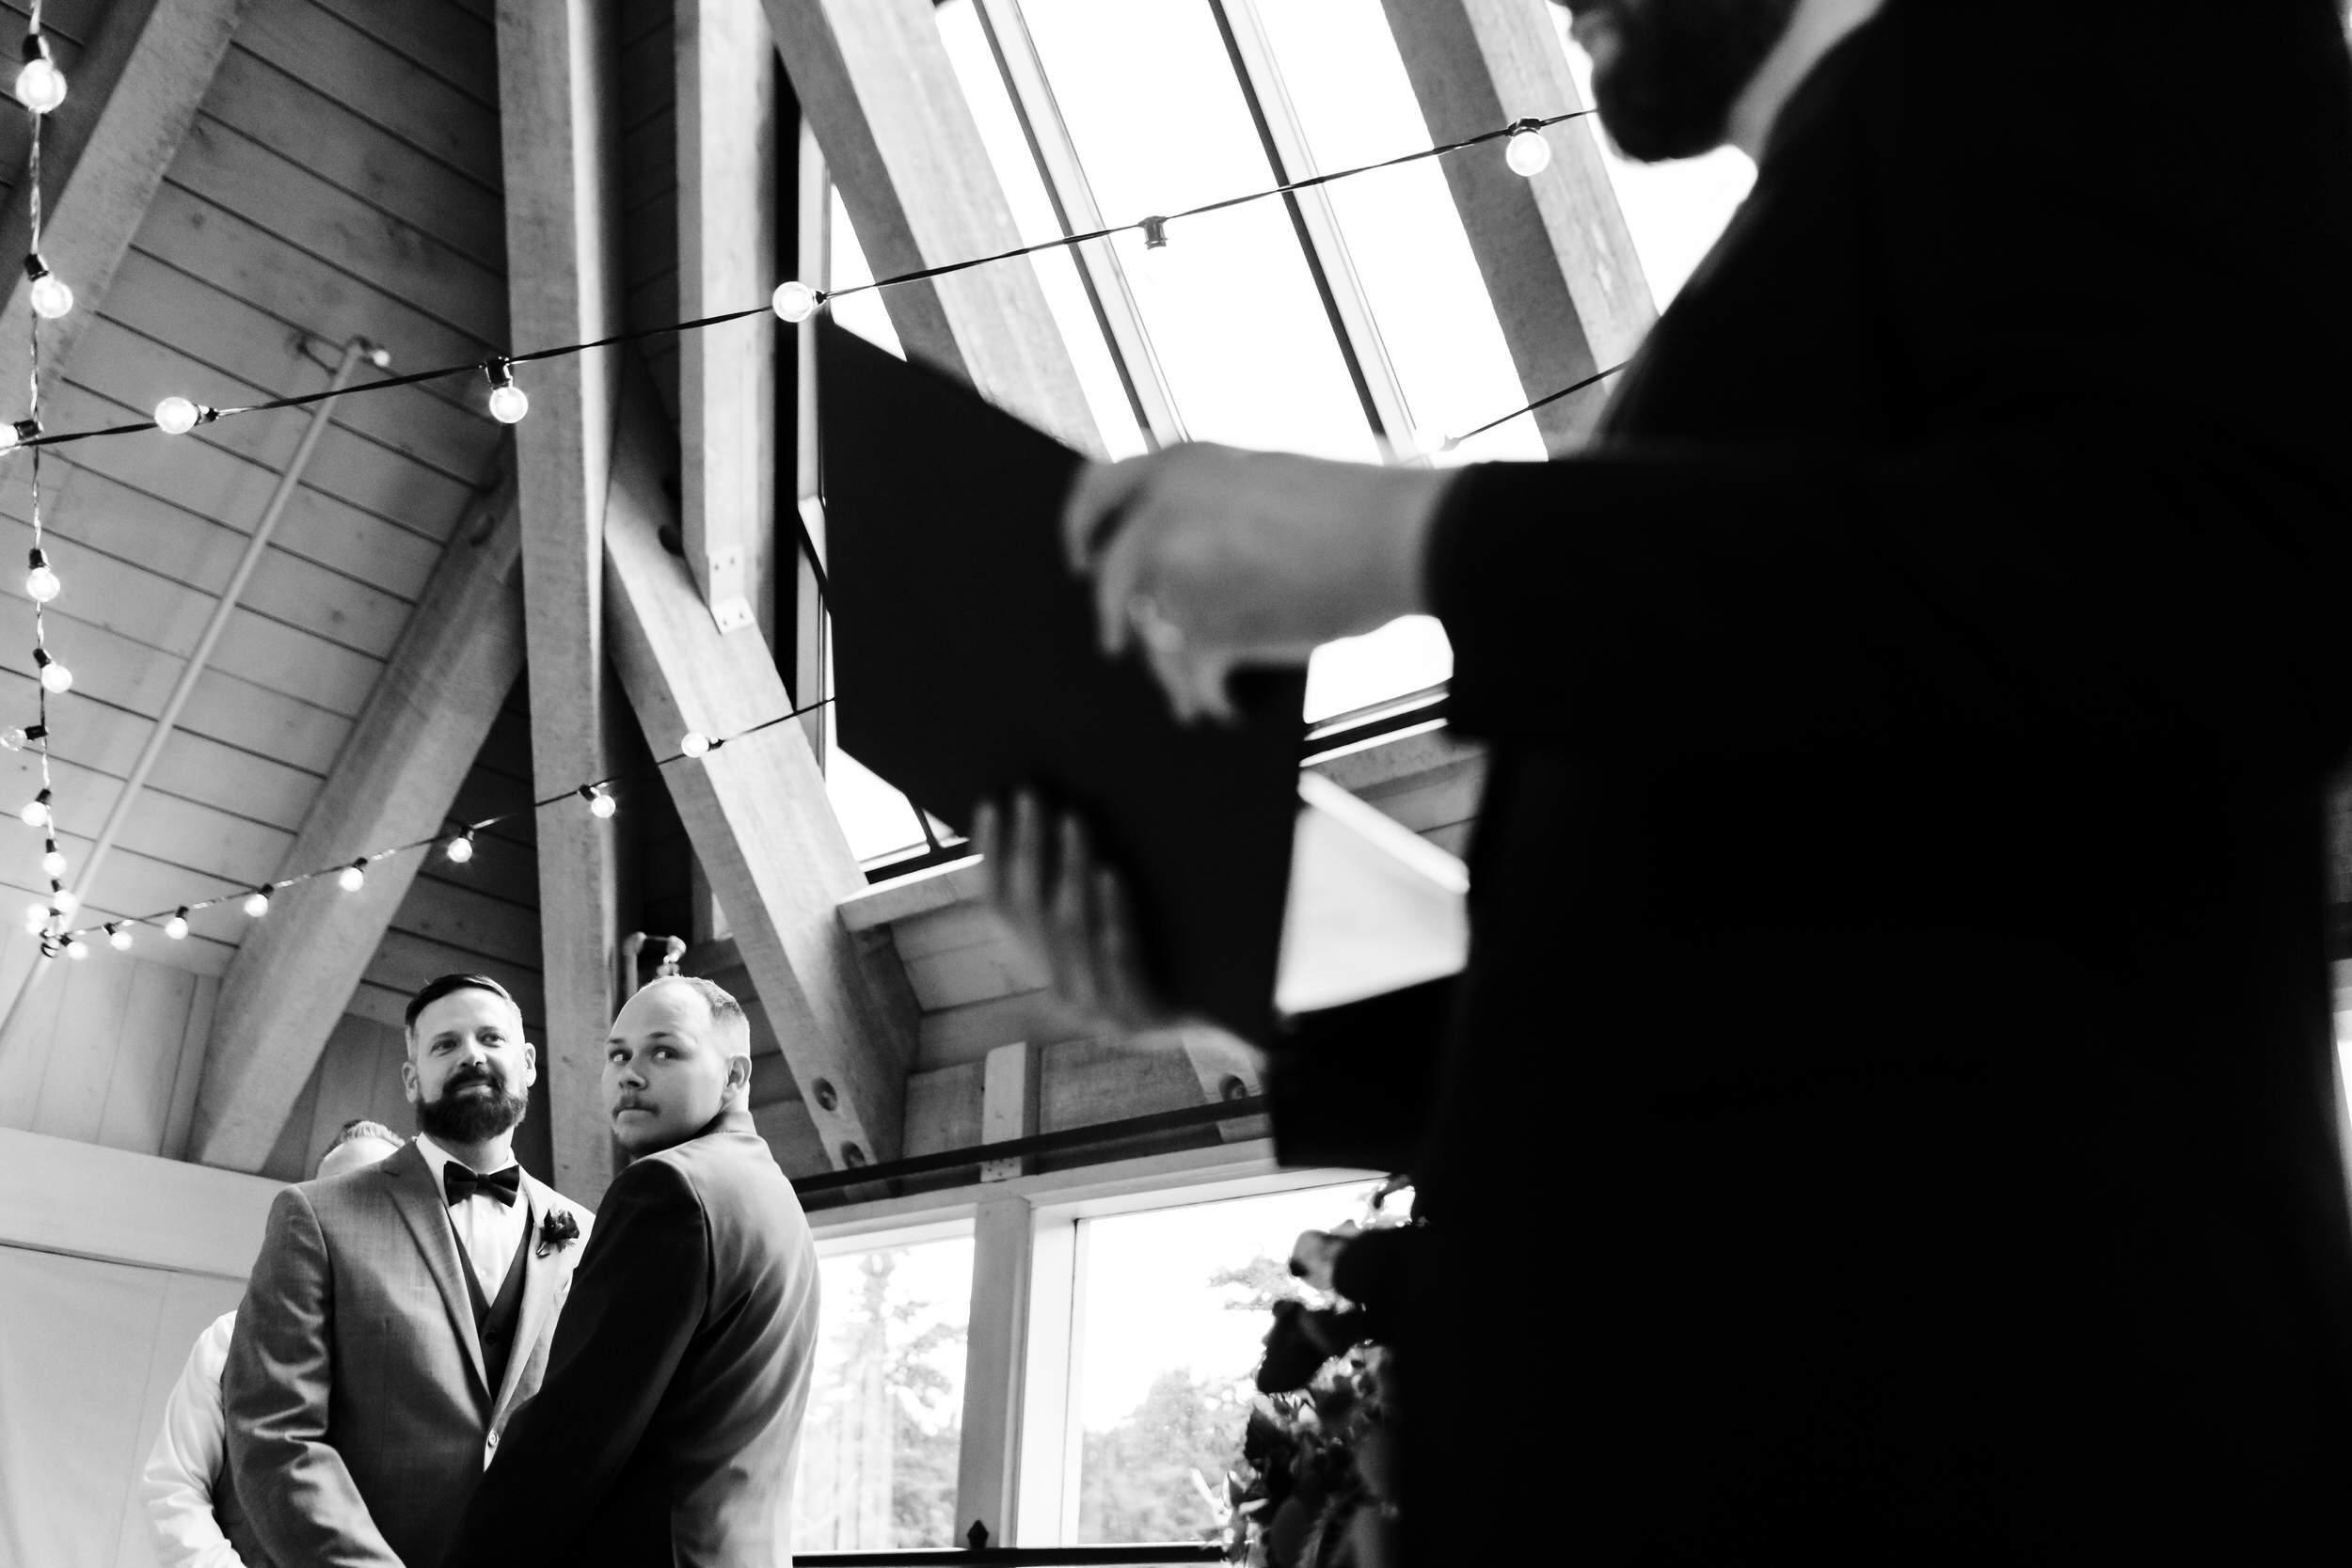 timberline_lodge_wedding_coltonjames_007